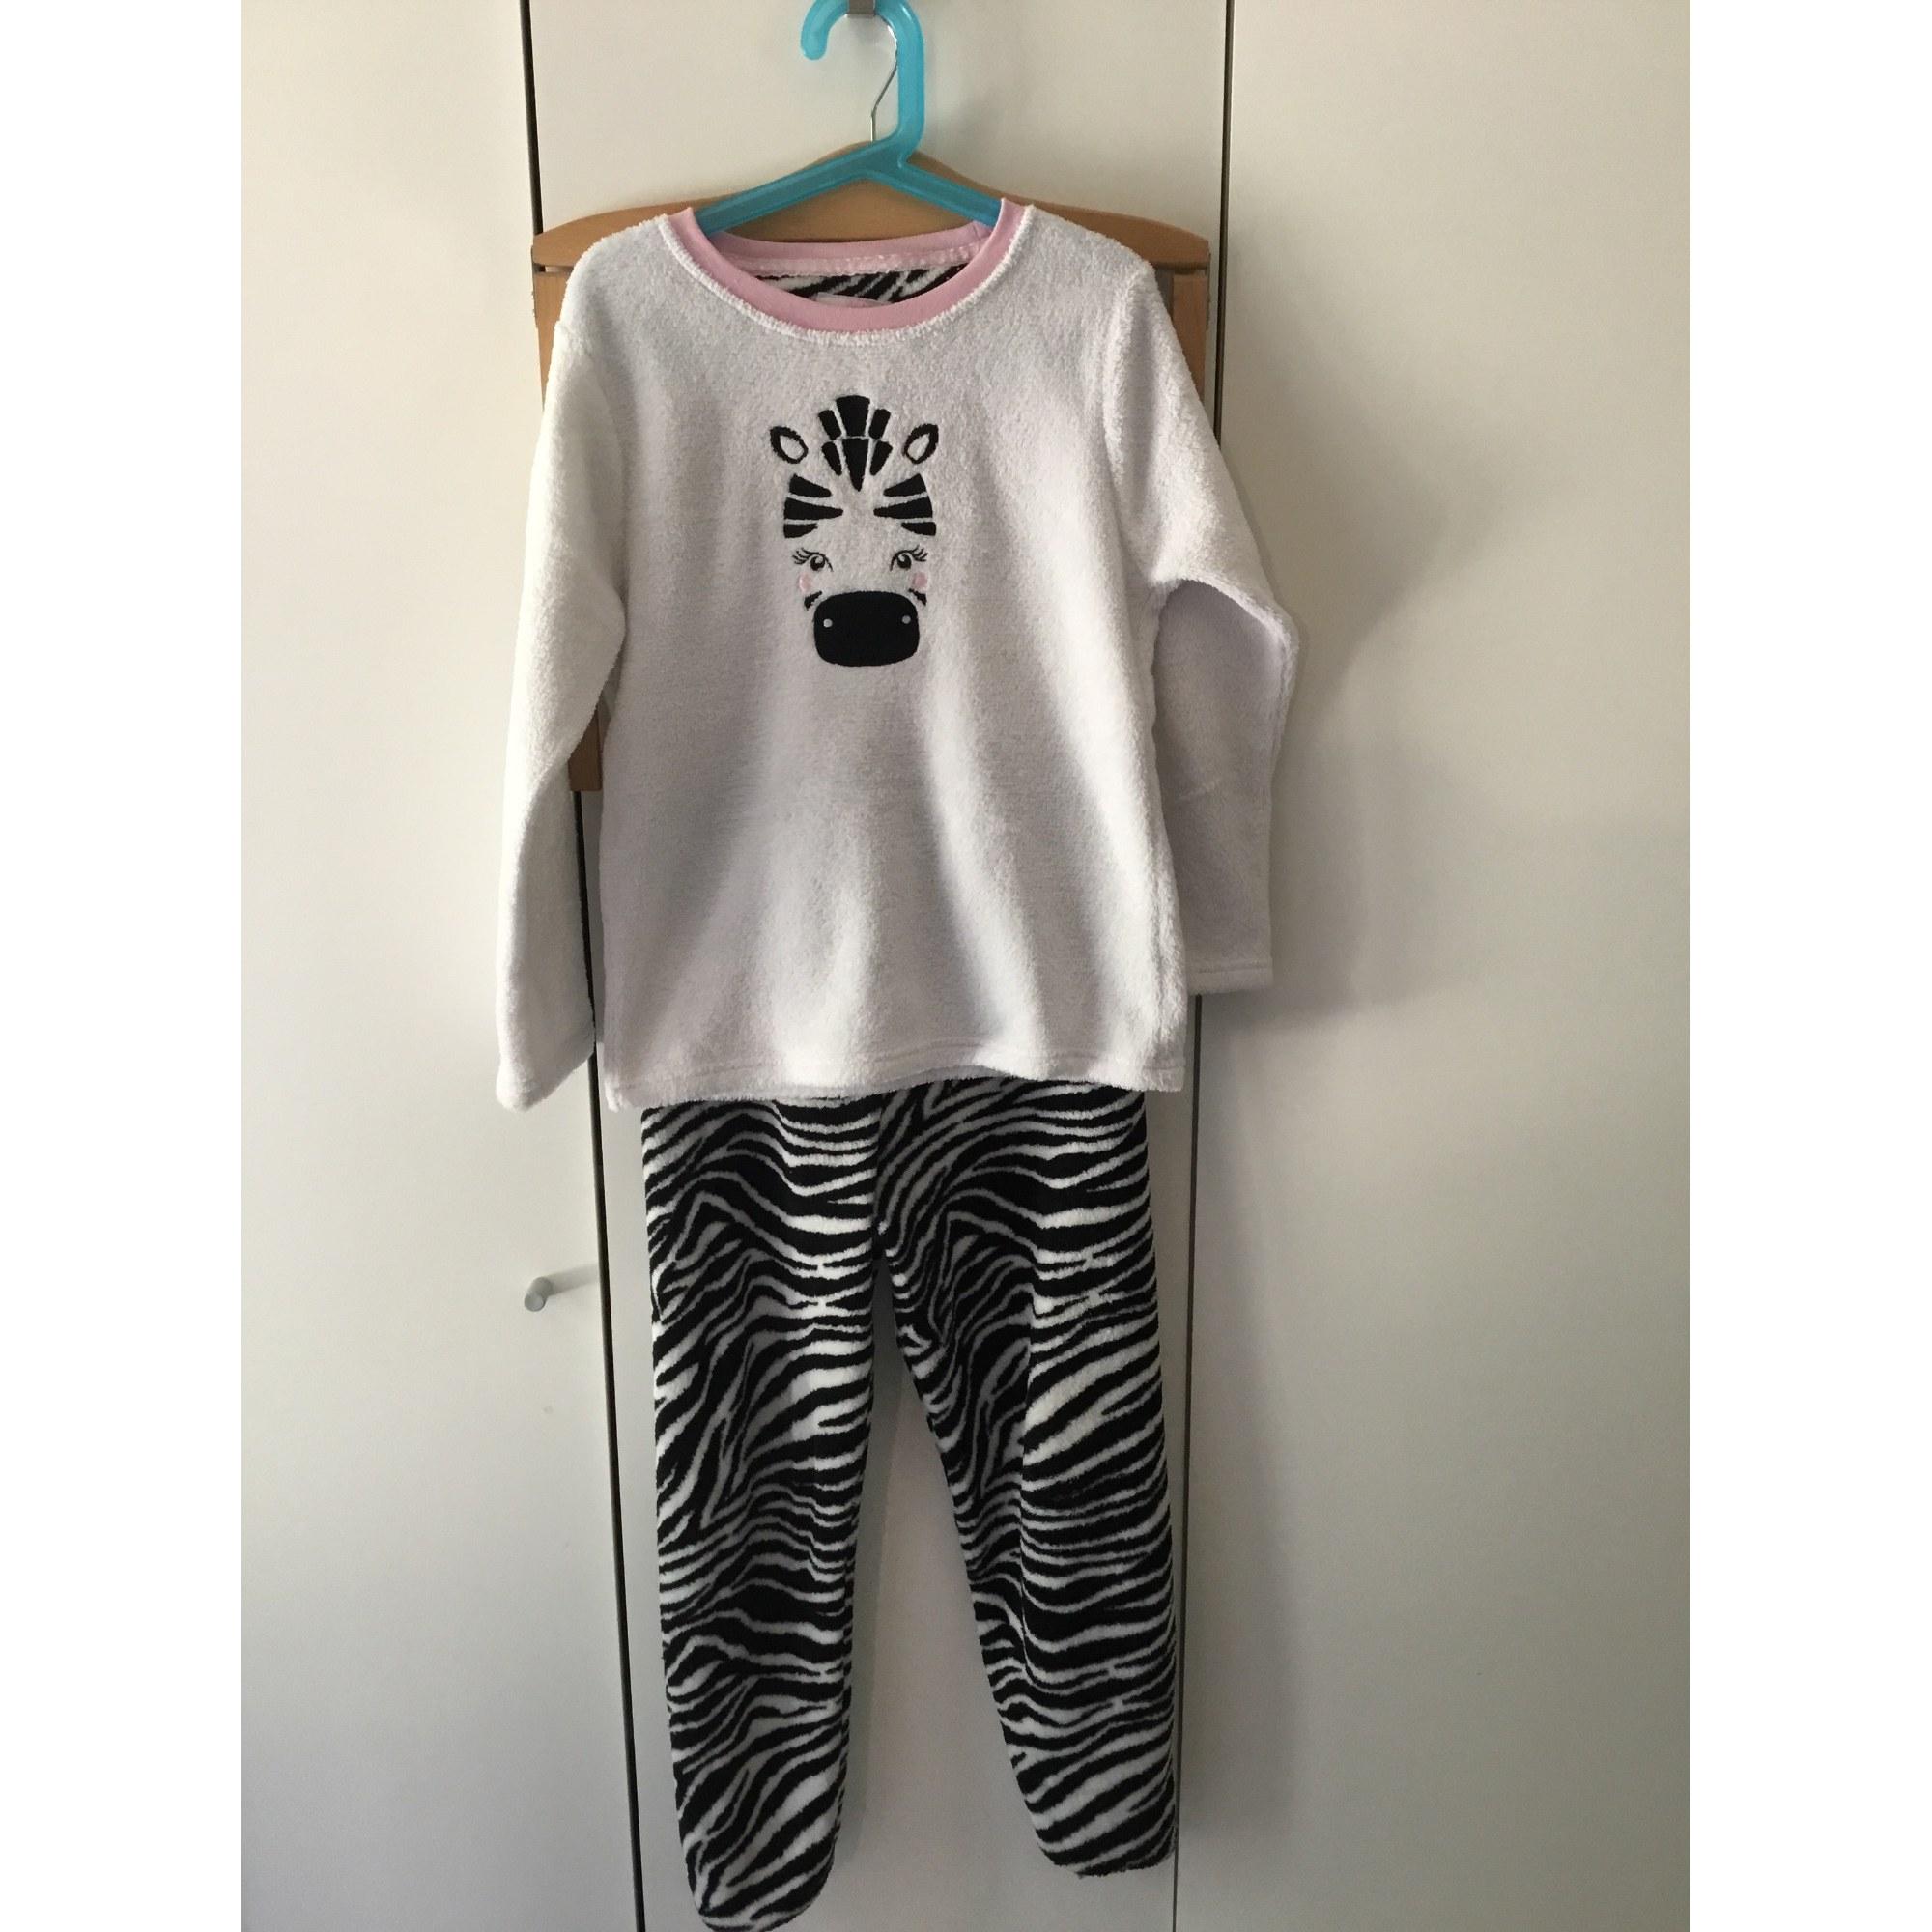 acd6d489d2cb Pyjama PRIMARK 9-10 ans blanc - 7955415